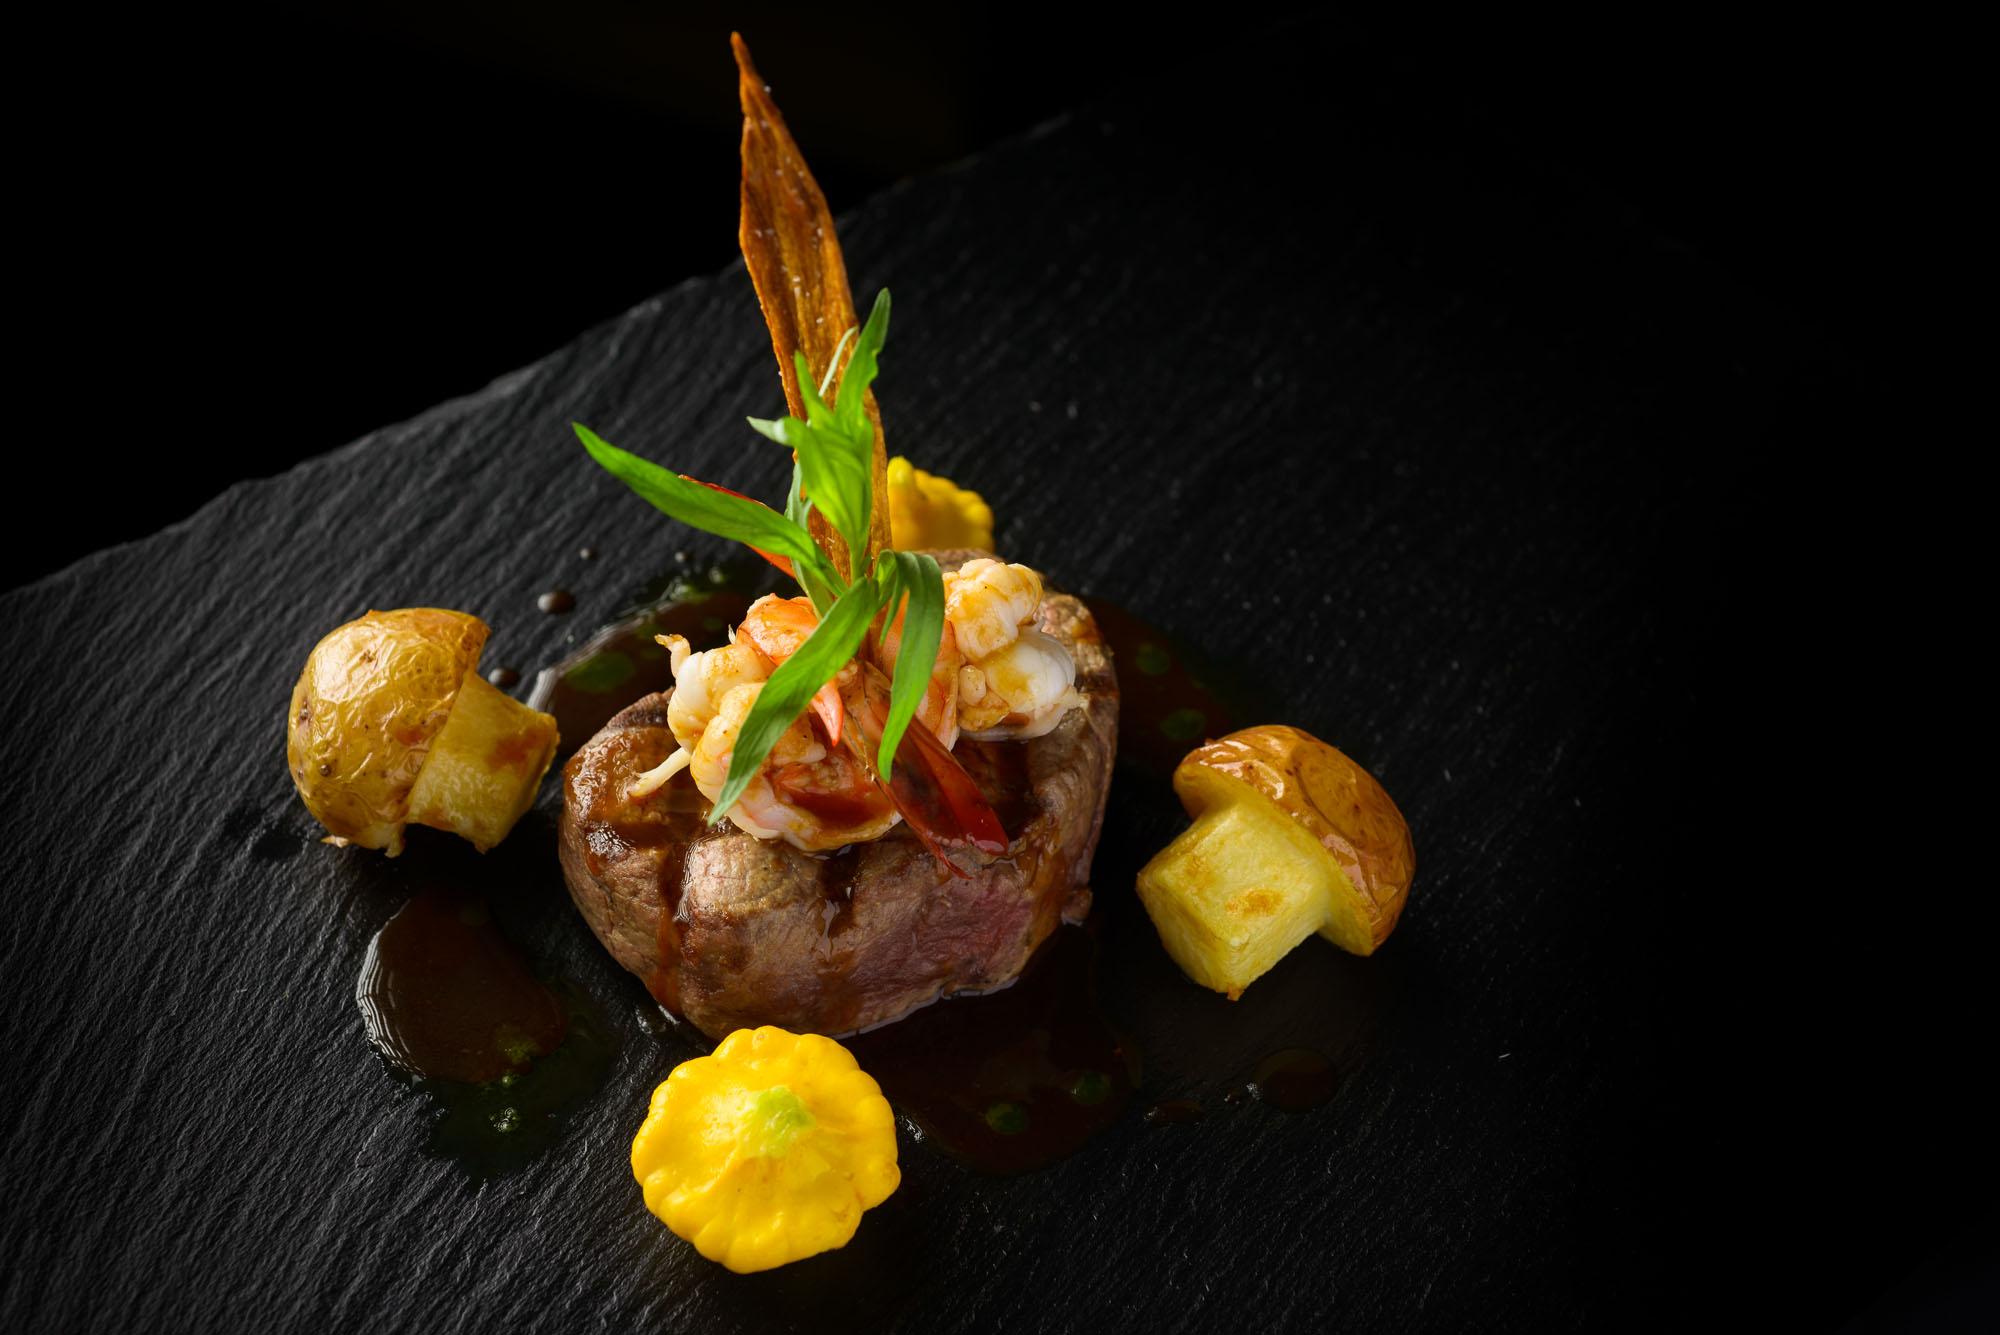 7460_d800b_Le_Papillon_San_Jose_Food_Photography.jpg